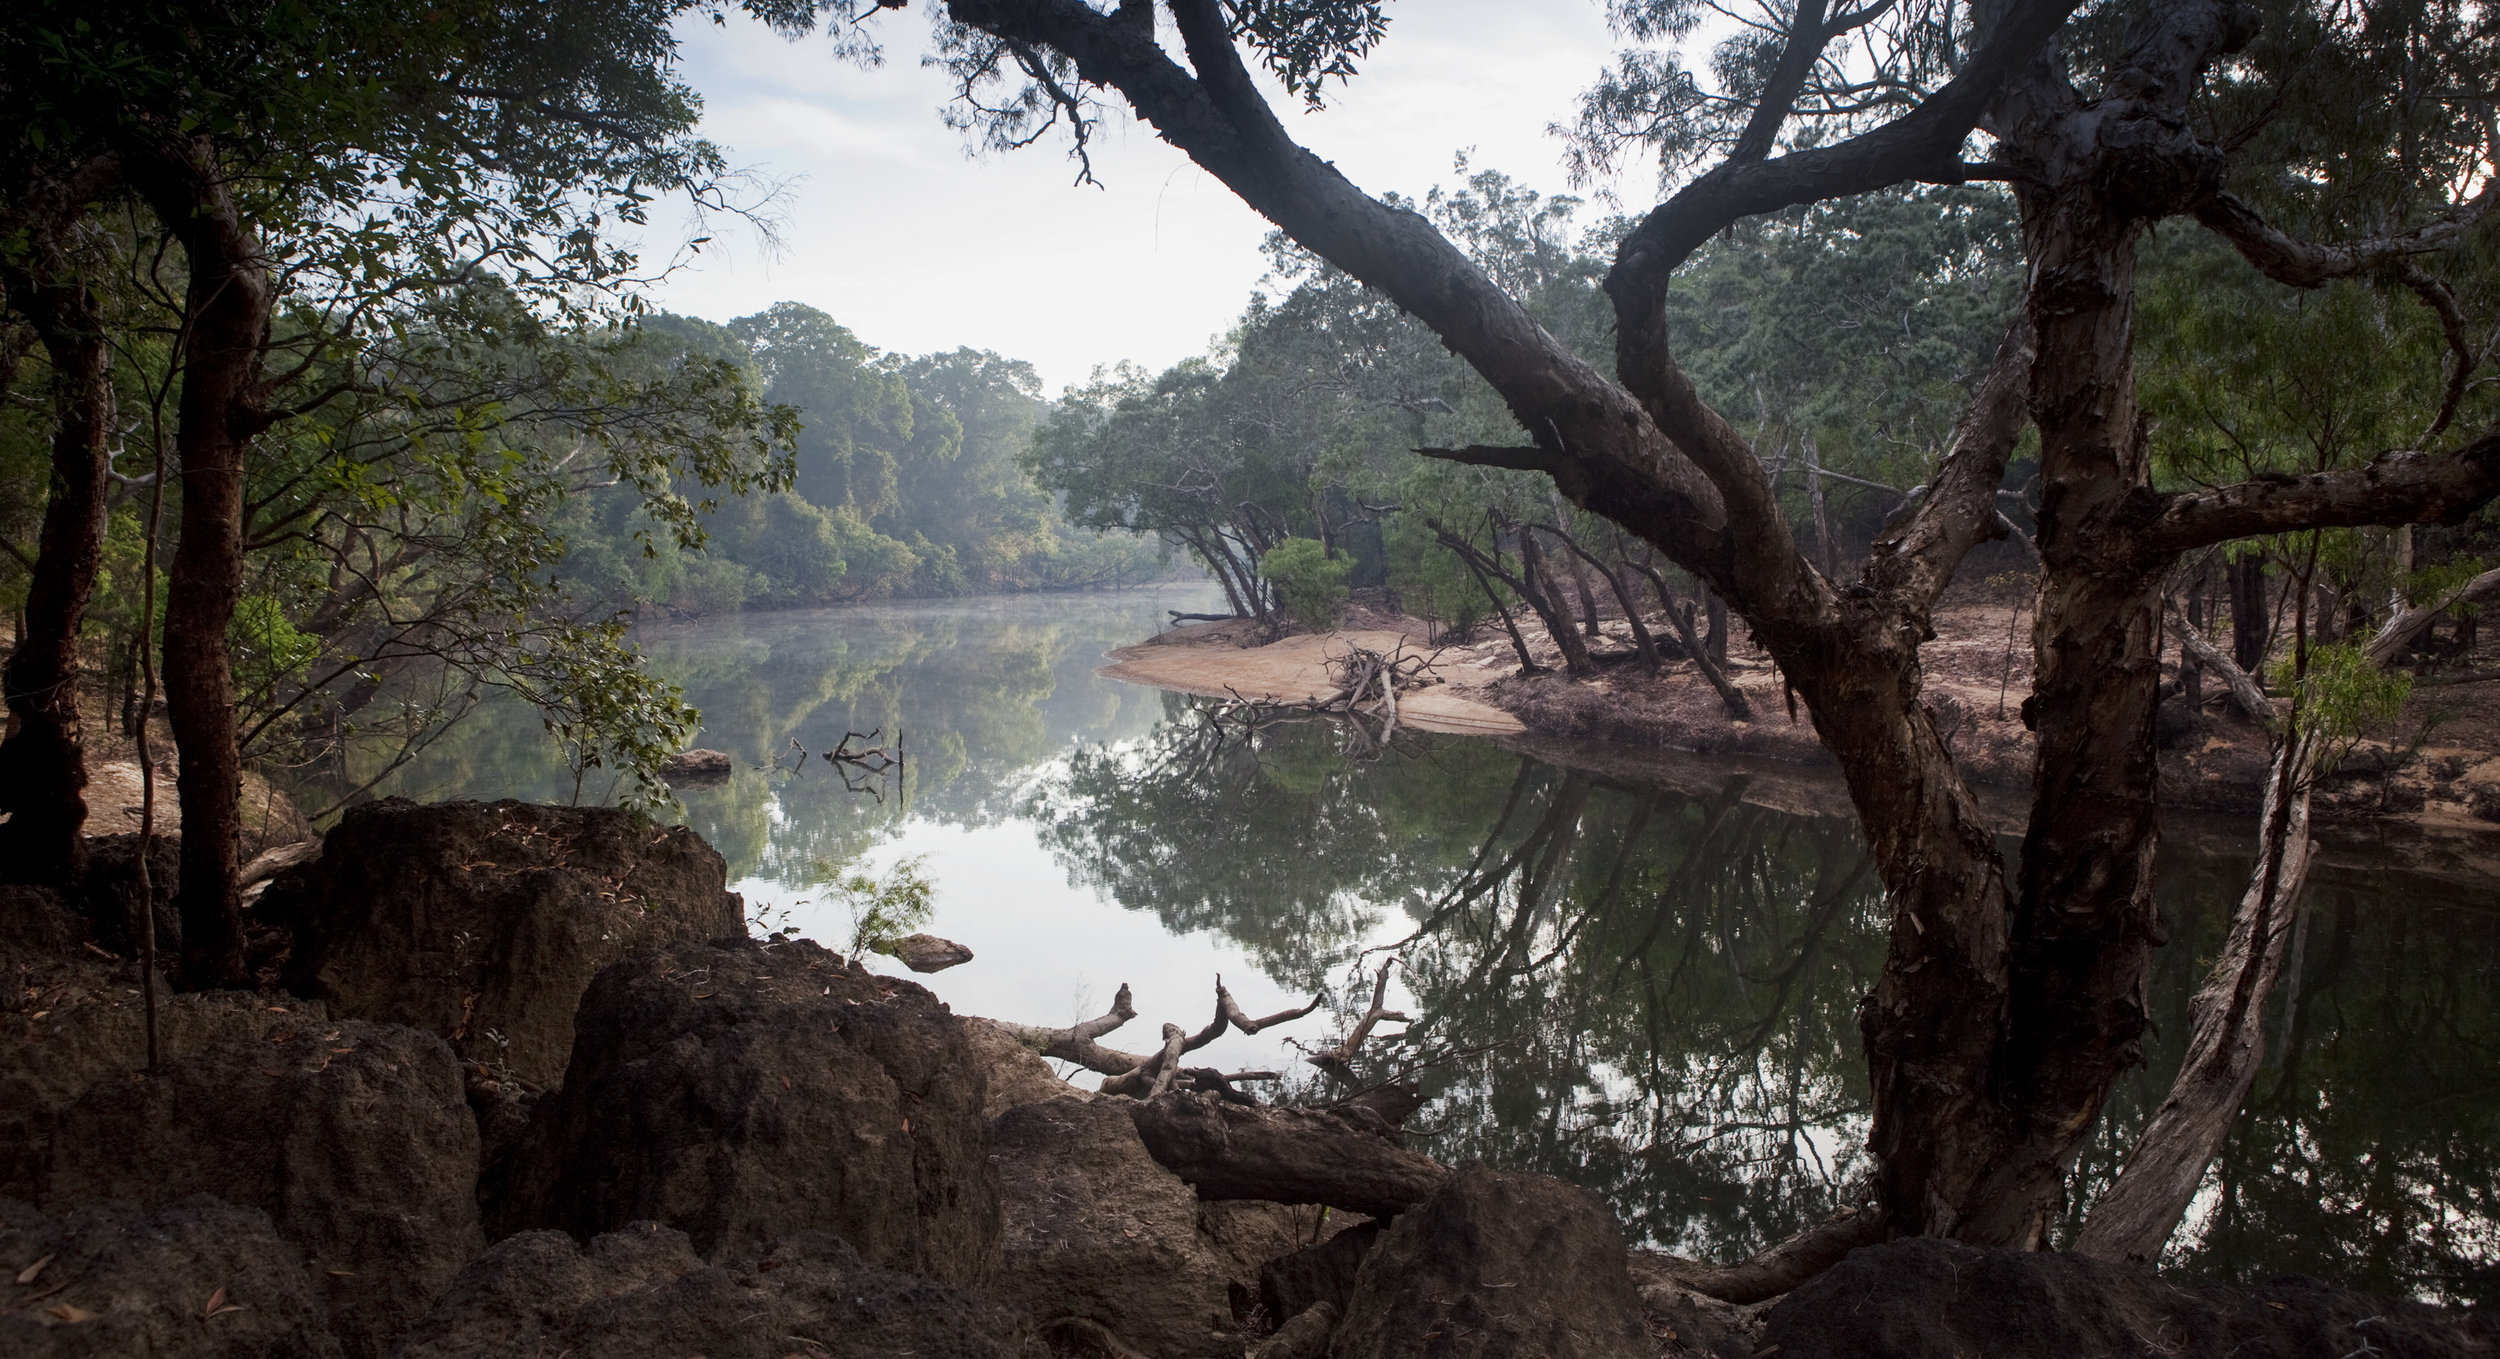 Boulder Bend, The Steve Irwin Wildlife Reserve. © Russell Shakespeare/Australia Zoo 2018